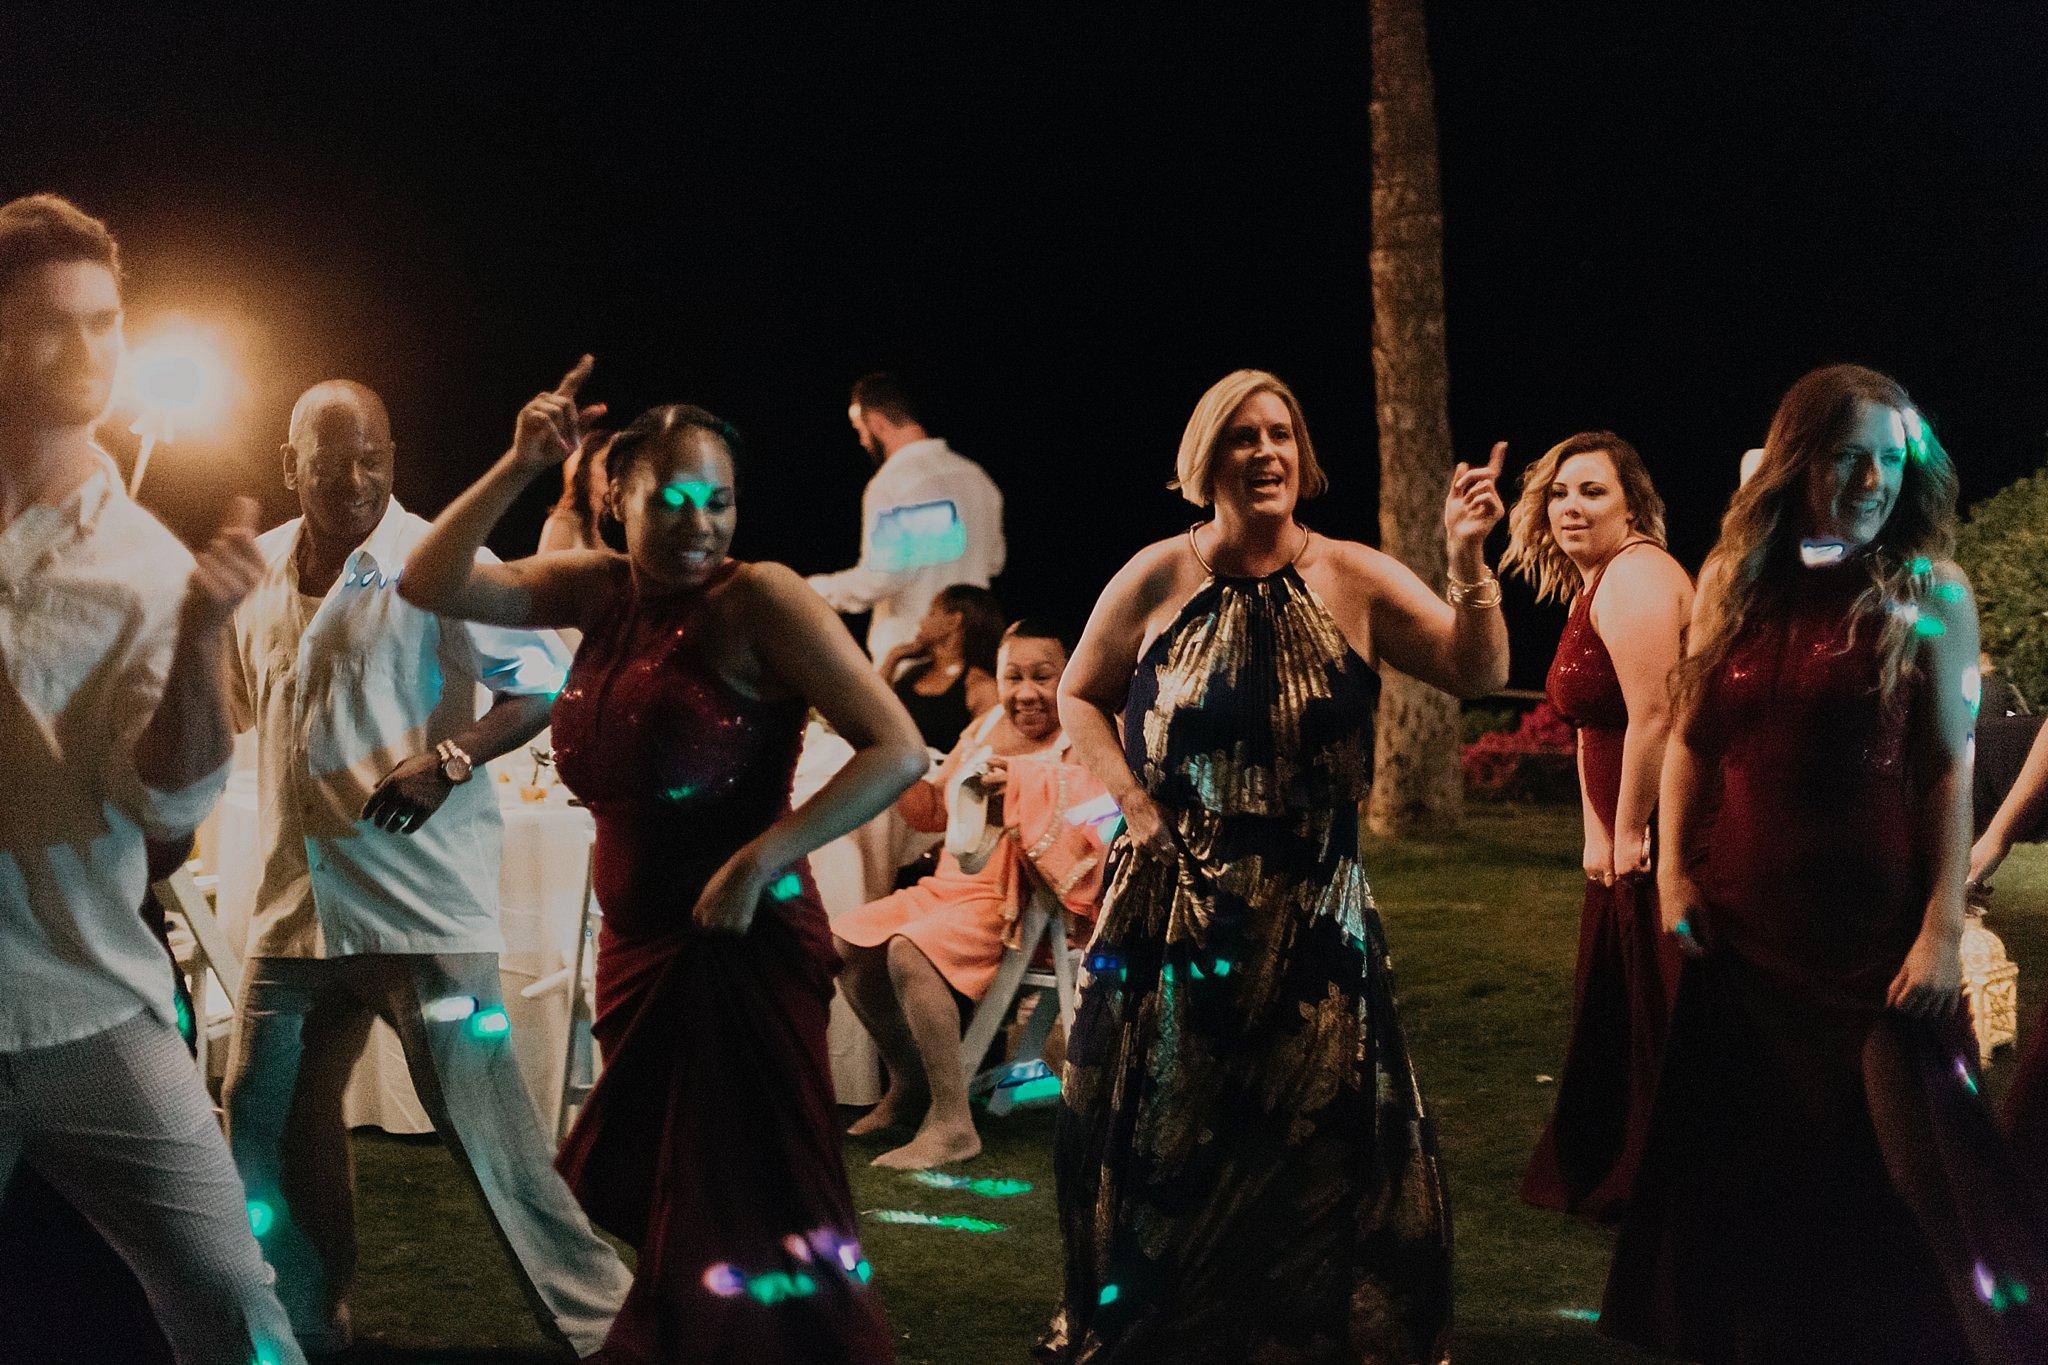 samantha_mcfarlen_bellingham_washington_engagement_photography_seattle_wedding_photographer_0266.jpg